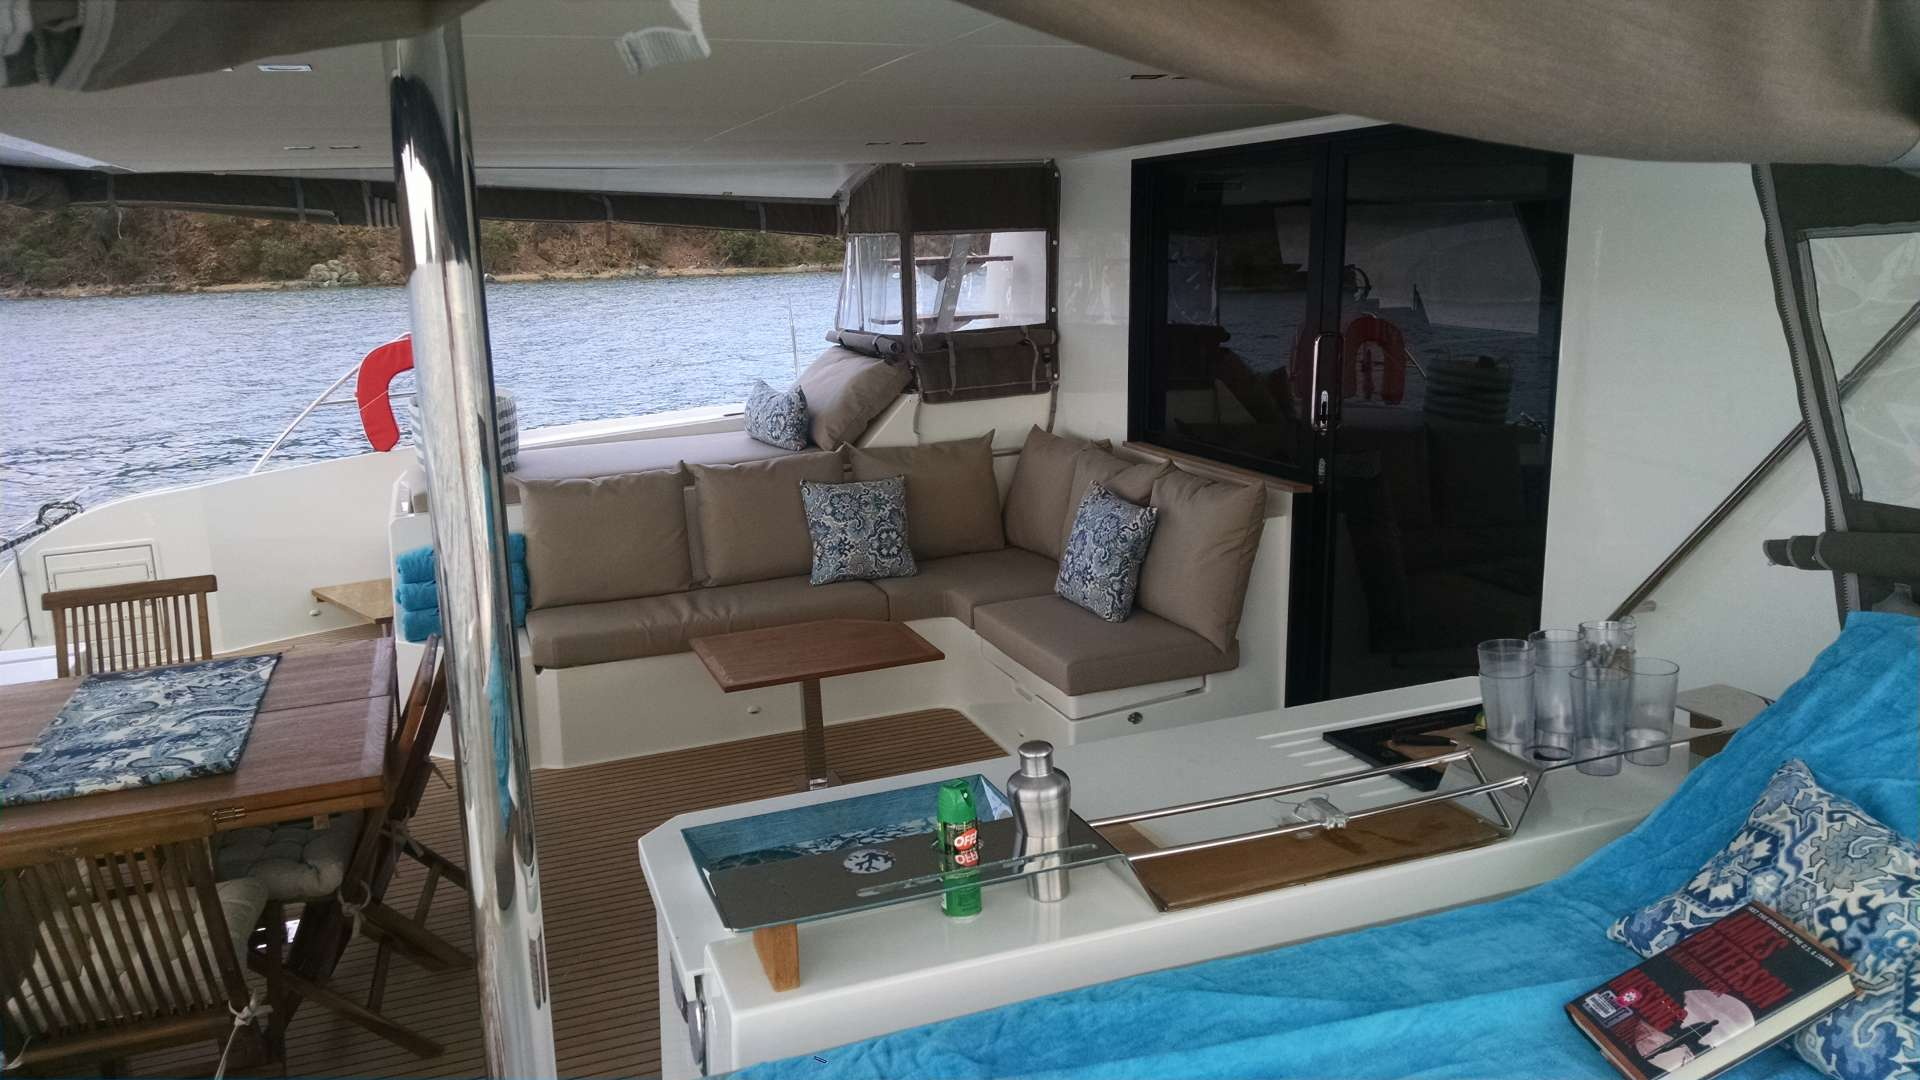 Cockpit seating area